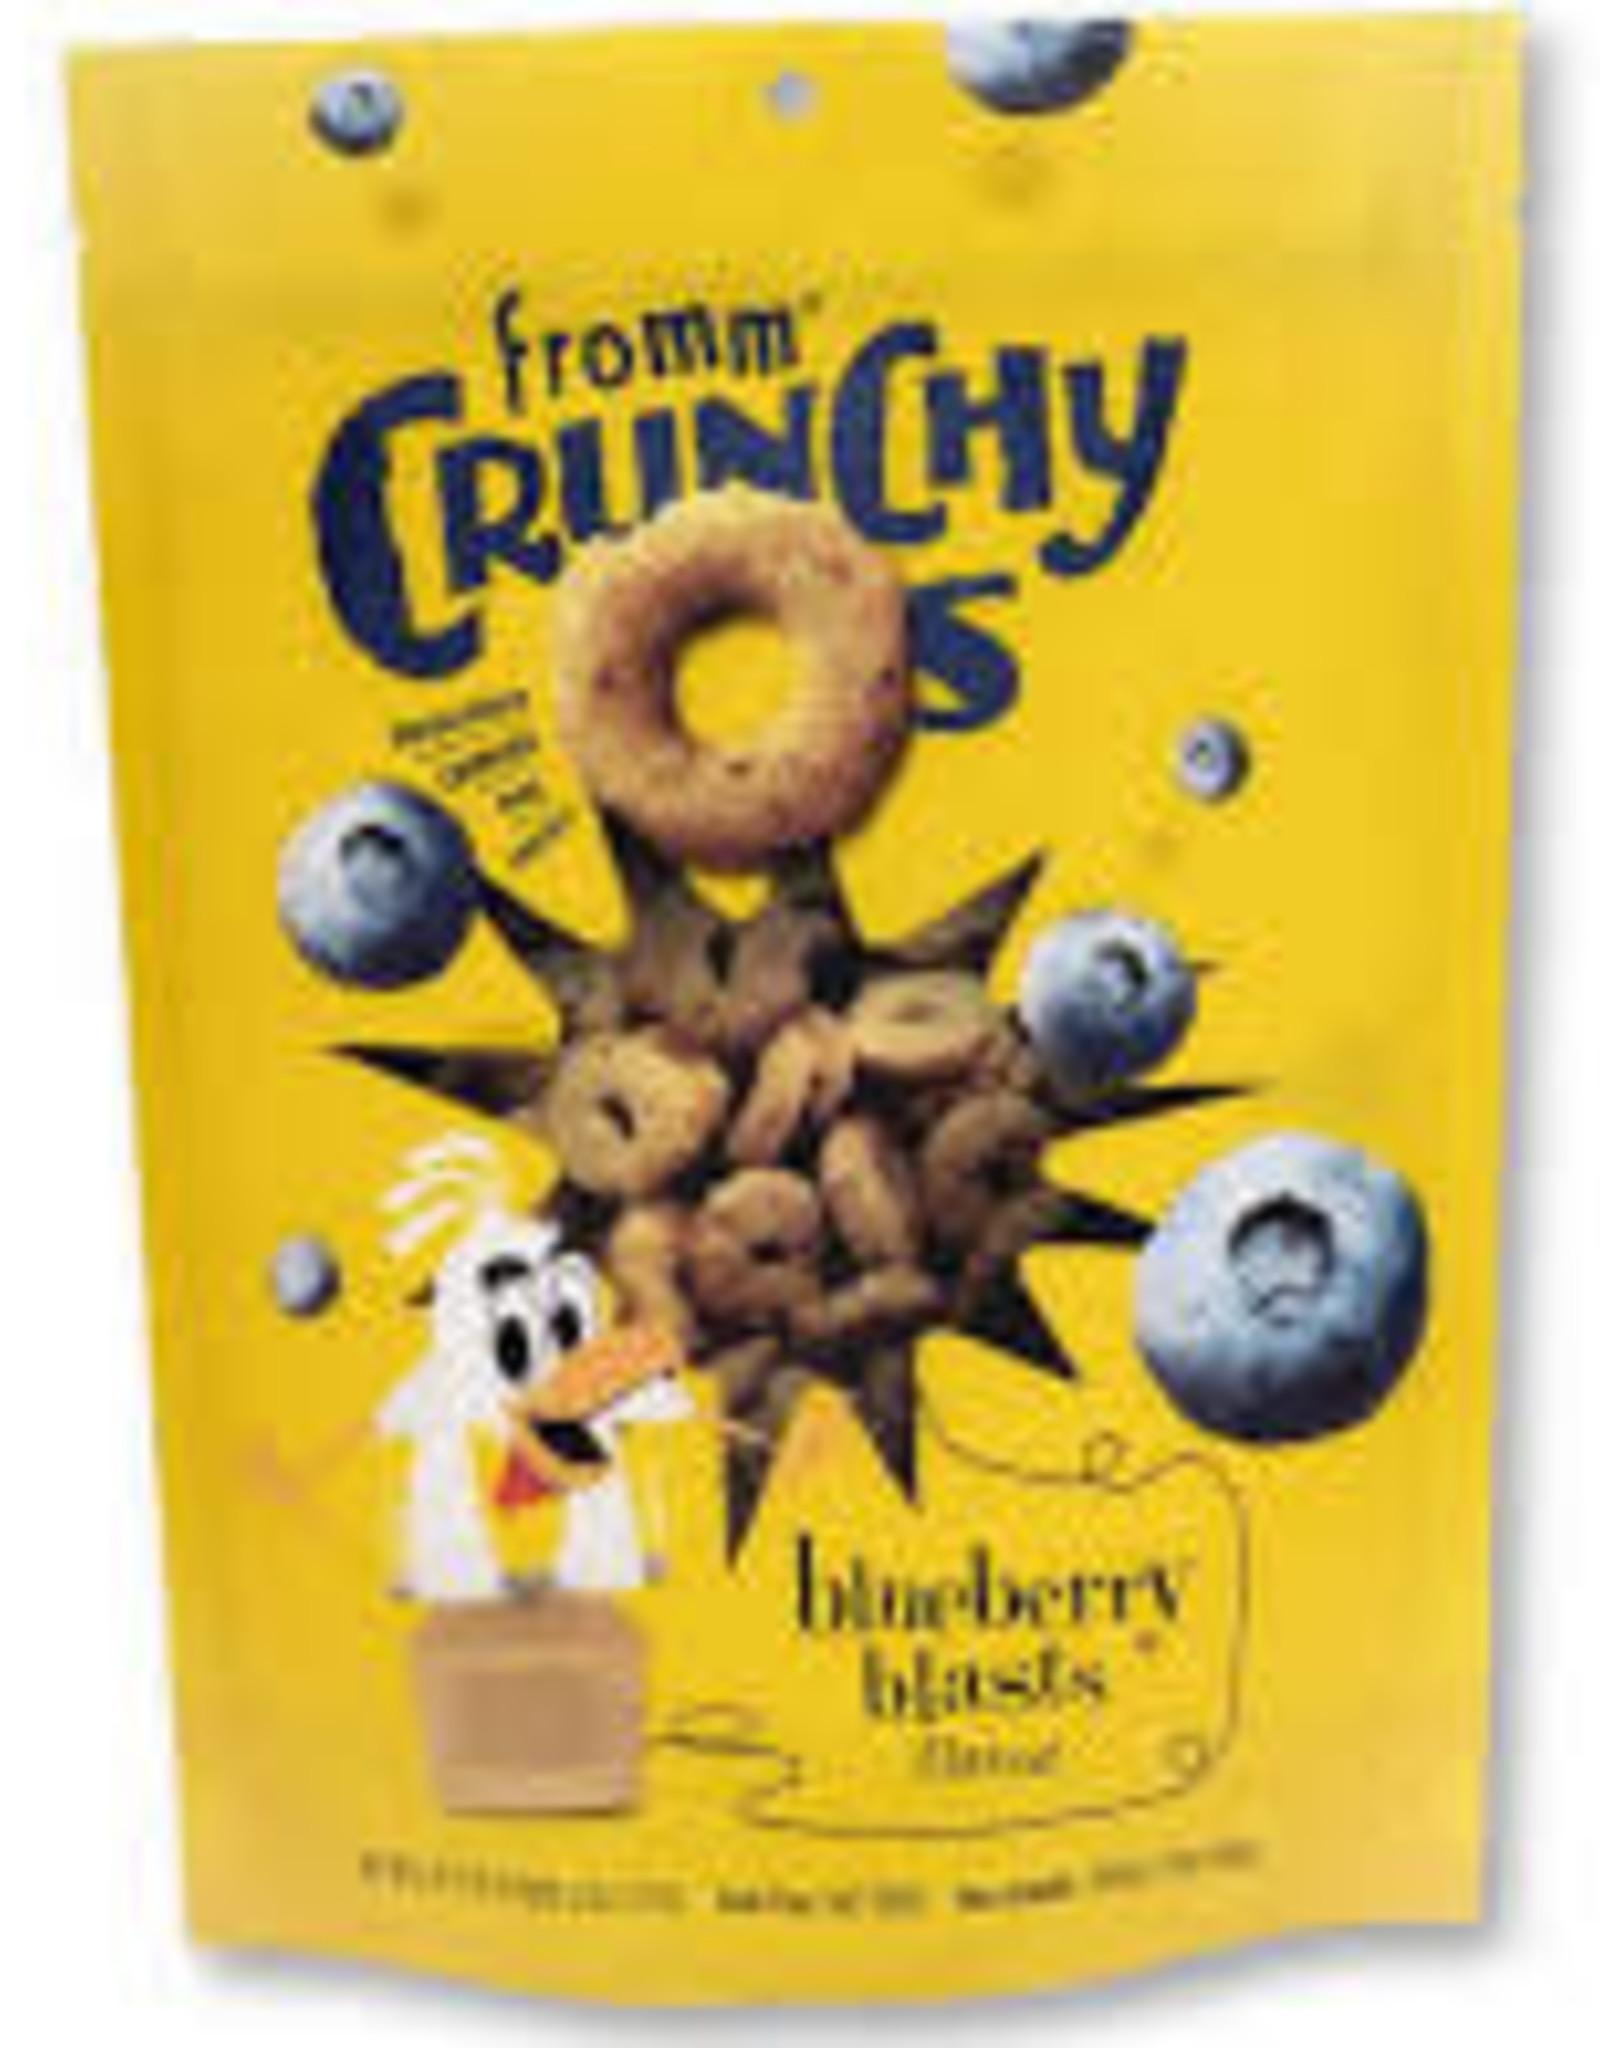 Fromm Crunchy Os Blueberry Blast